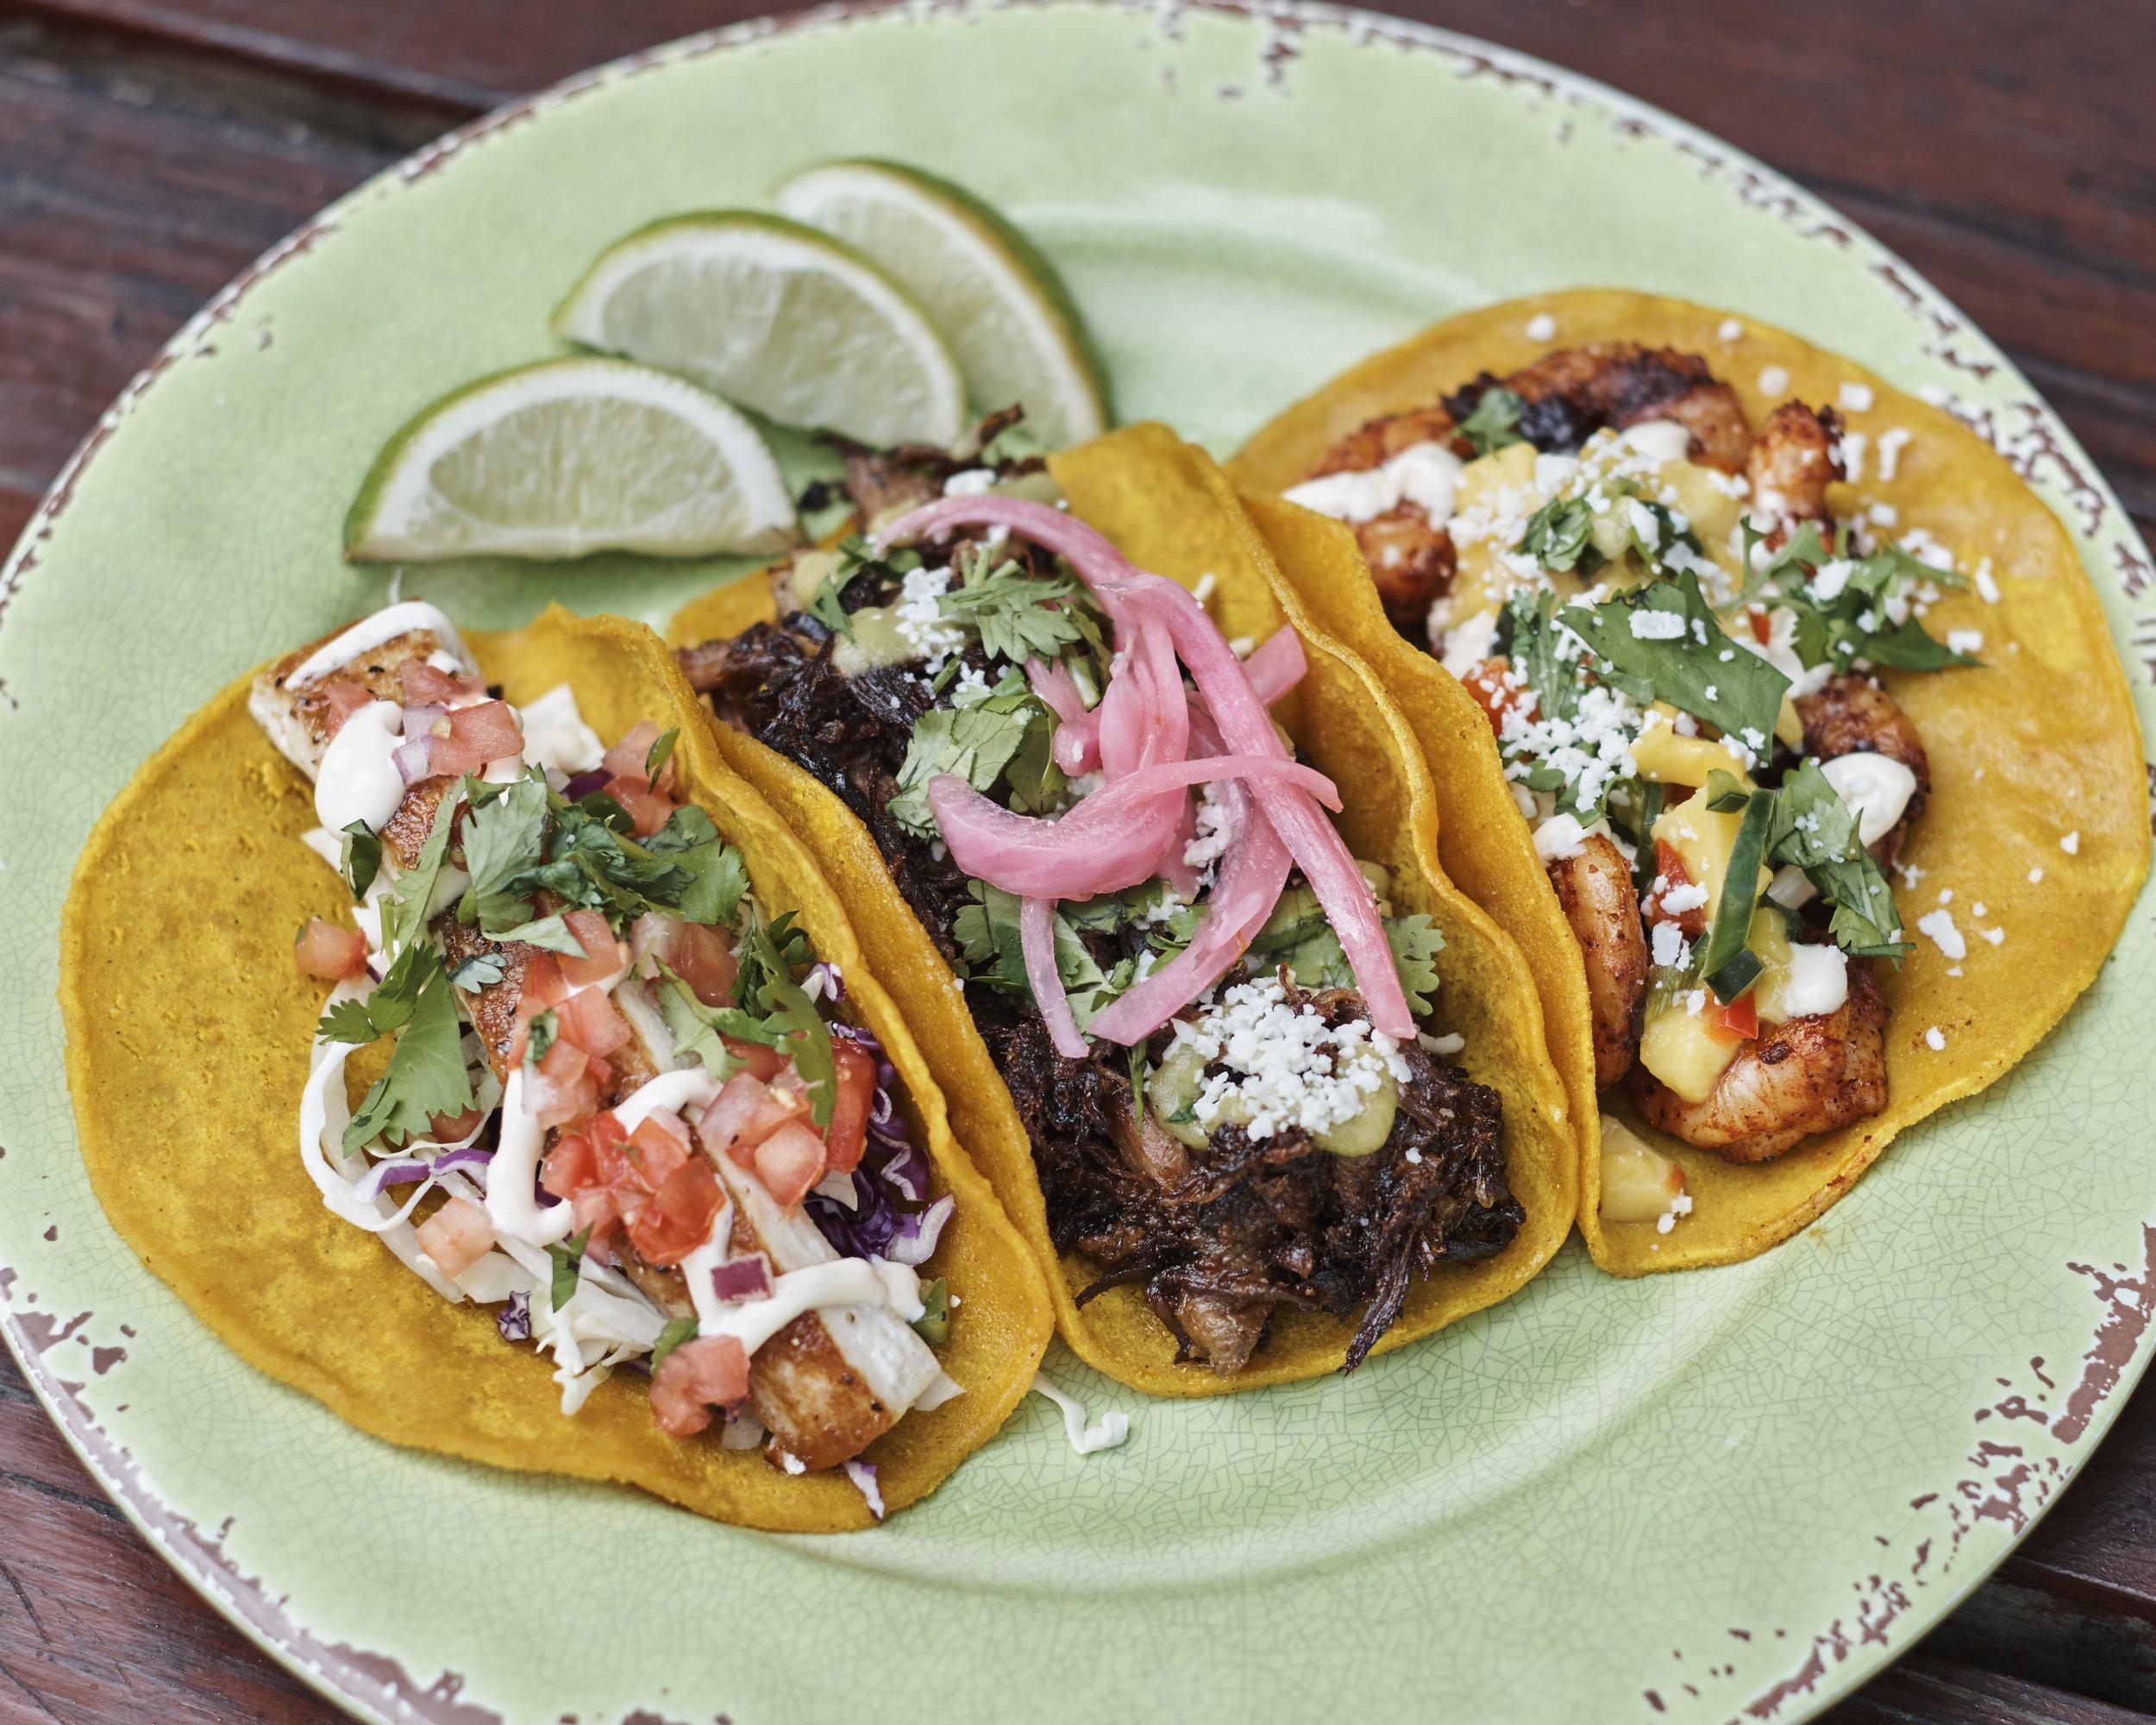 From left to right - Mahi Mahi Taco, Carnitas Pork Taco, & Gulf Shrimp Taco